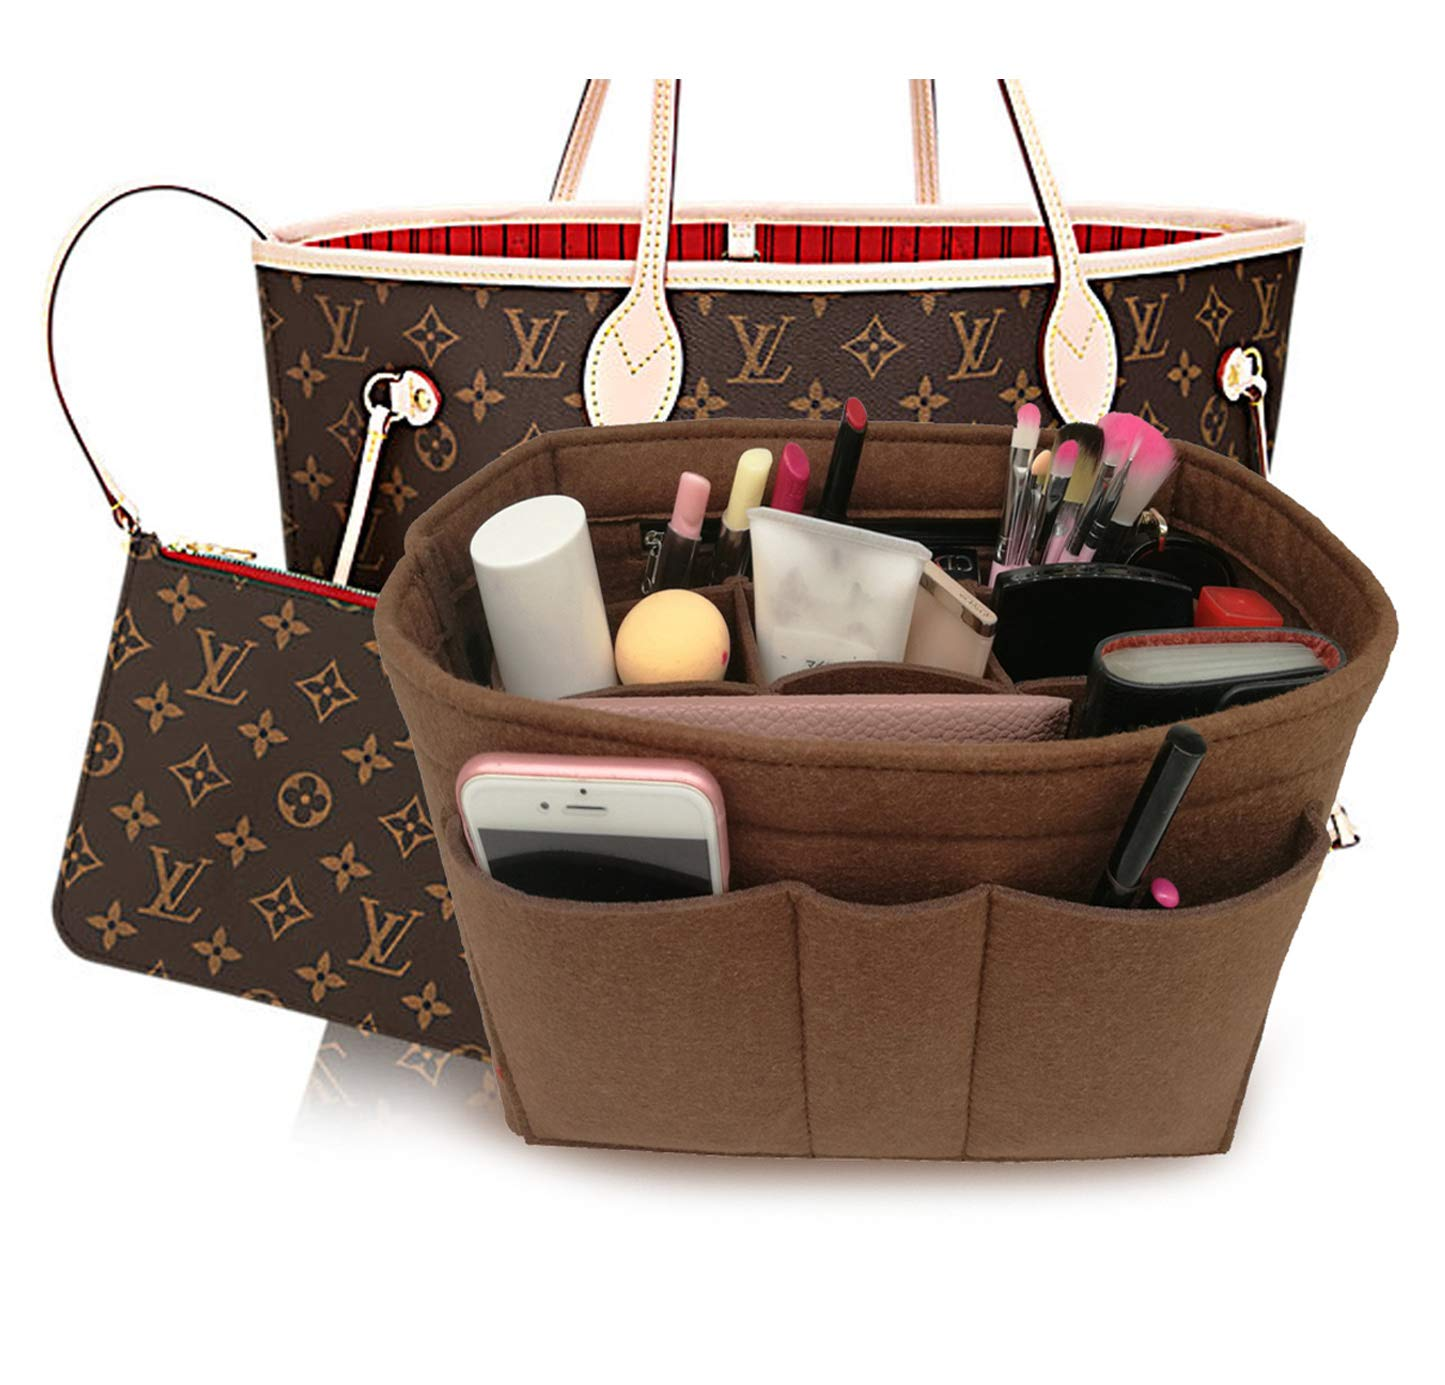 LEXSION Felt Insert Fabric Purse Organizer Bag, Bag Insert in Bag with Zipper Inner Pocket Brown XL by LEXSION (Image #1)